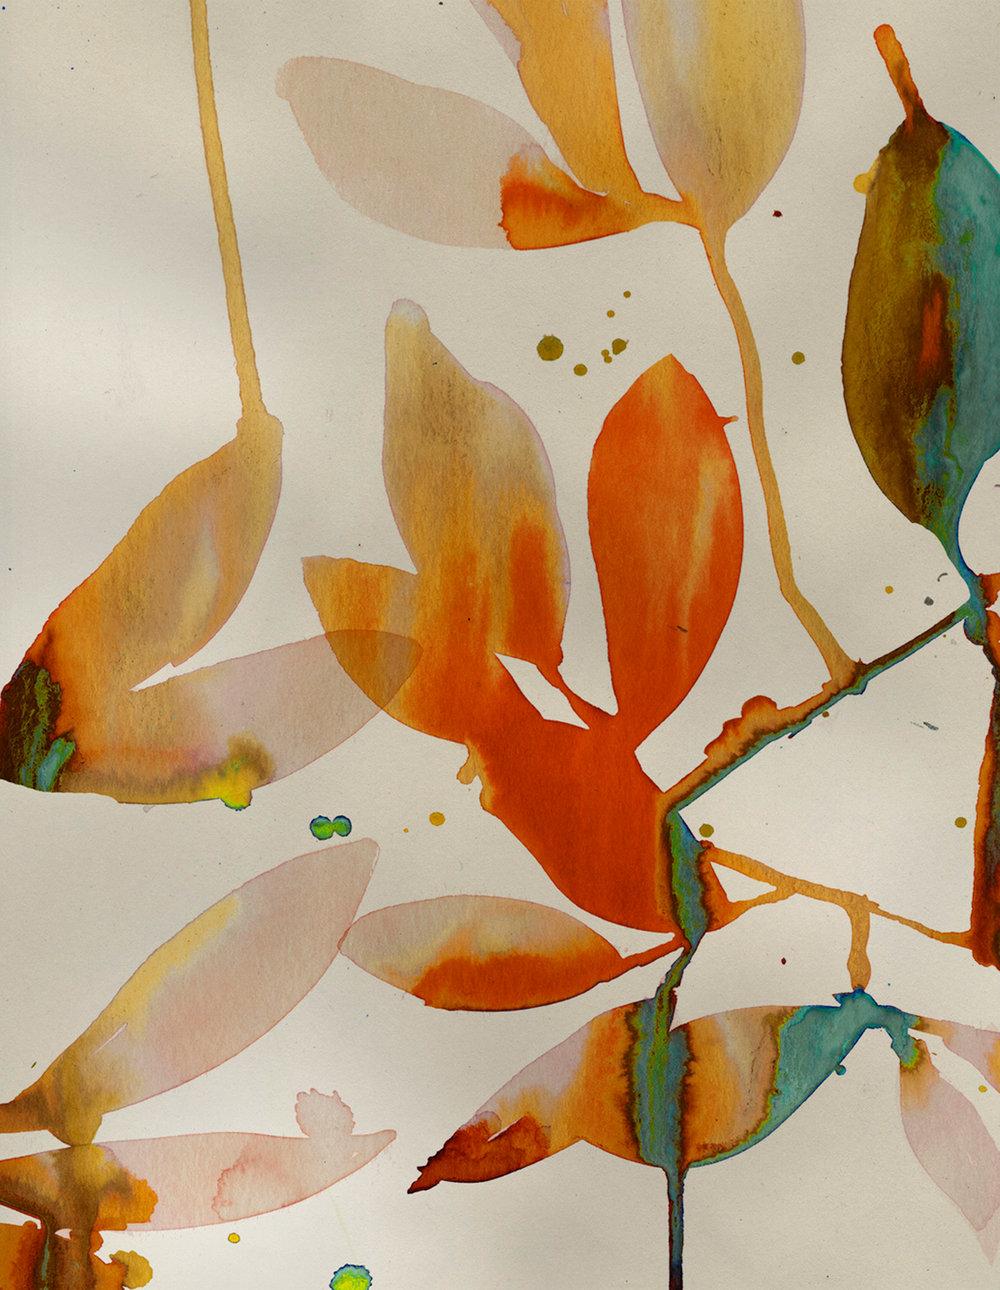 stina-persson-illustration-watercolor-lagom-design-fall-leaves.jpg